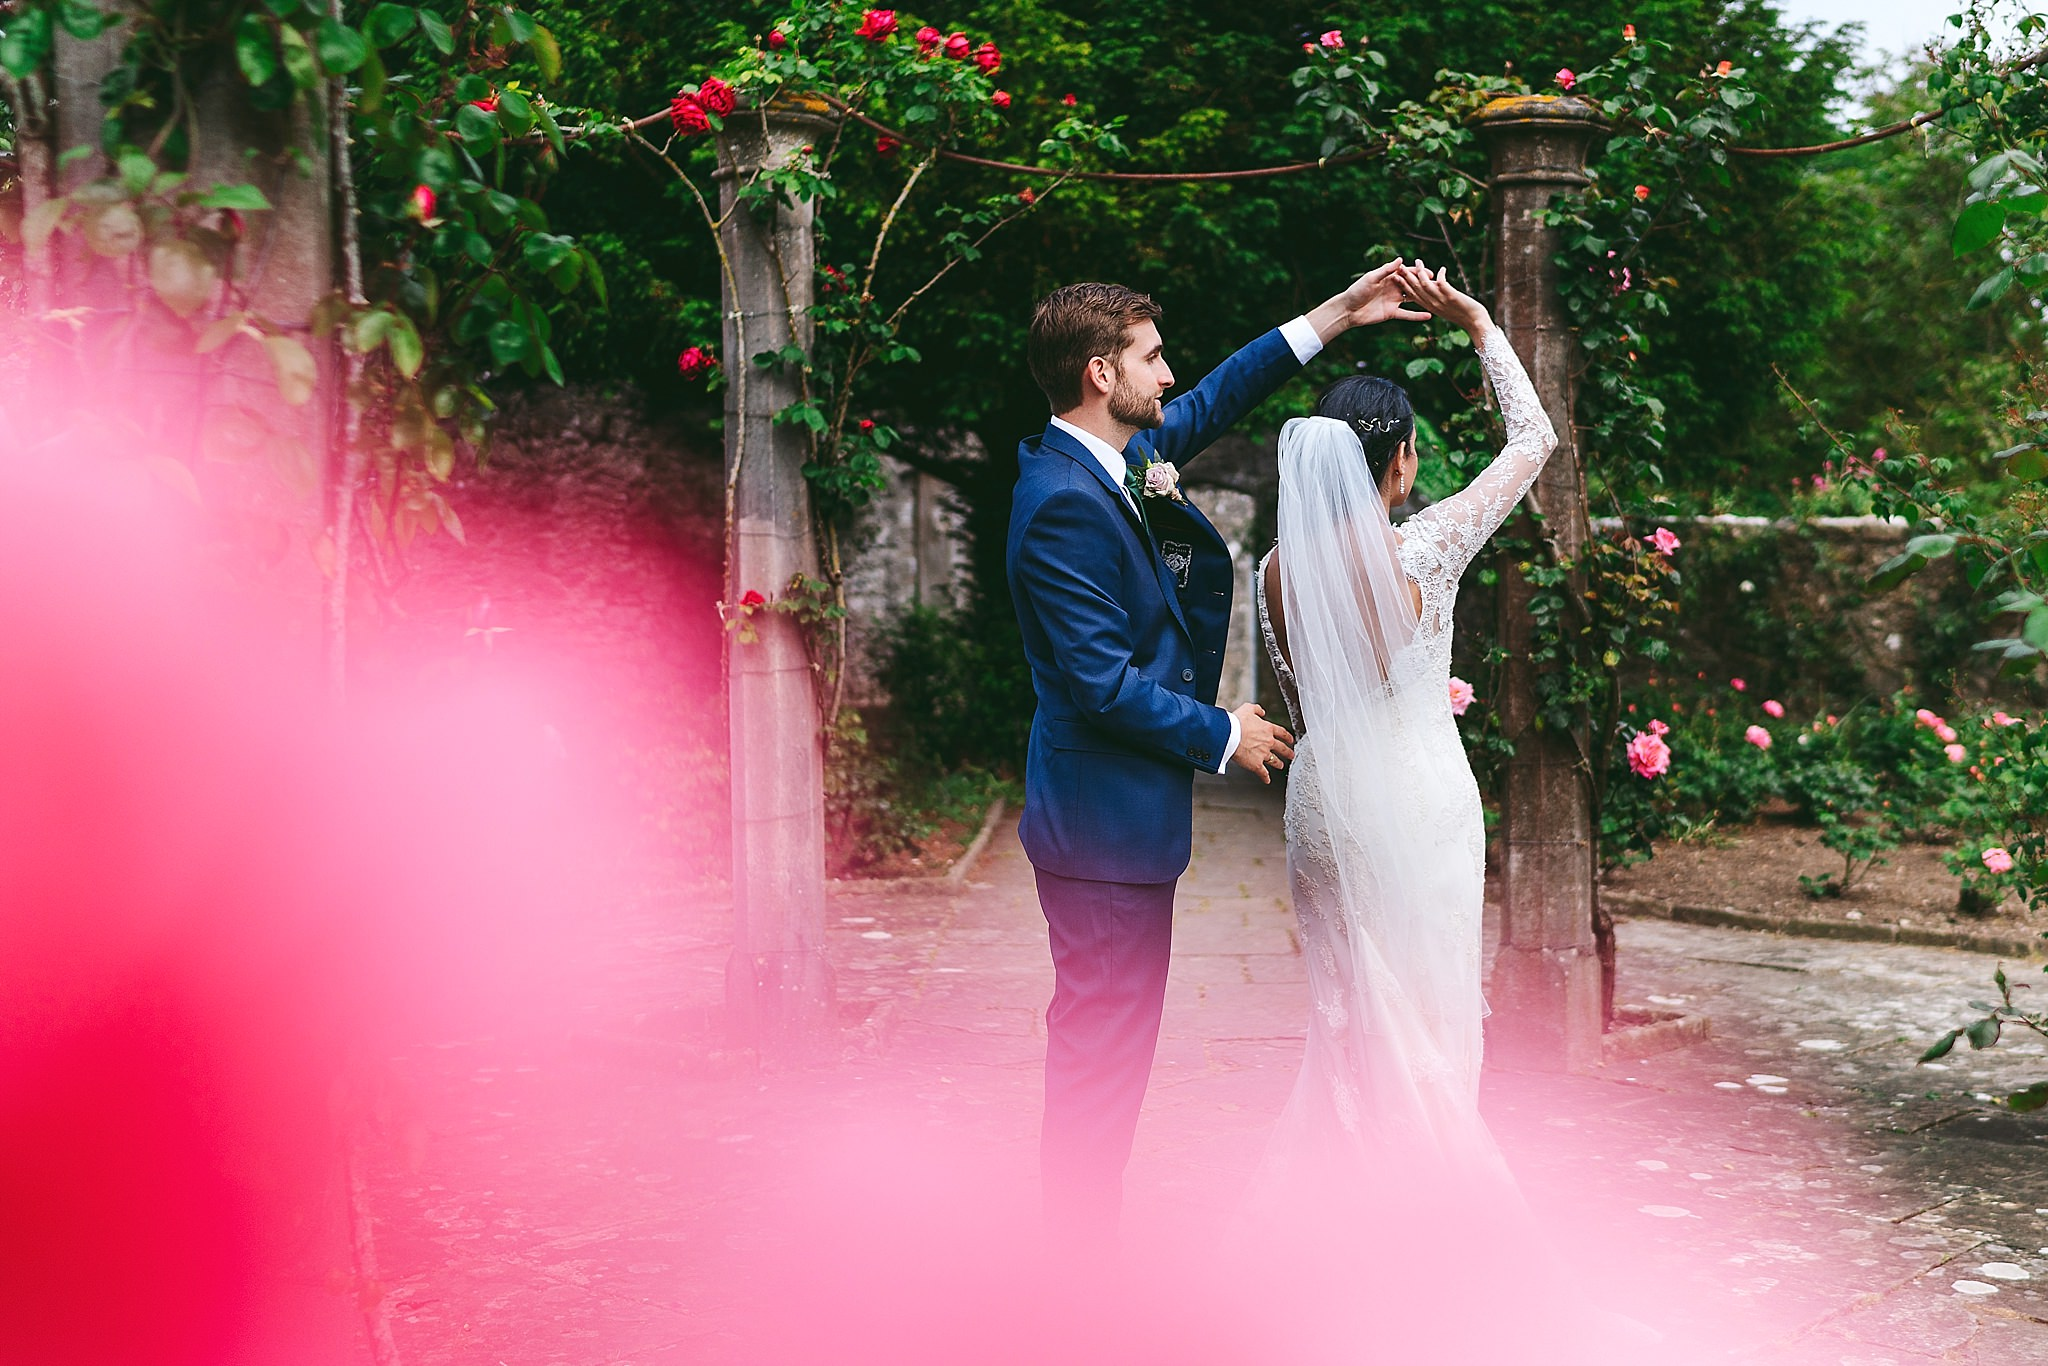 aga-tomaszek-wedding-photographer-cardiff-2016_1124